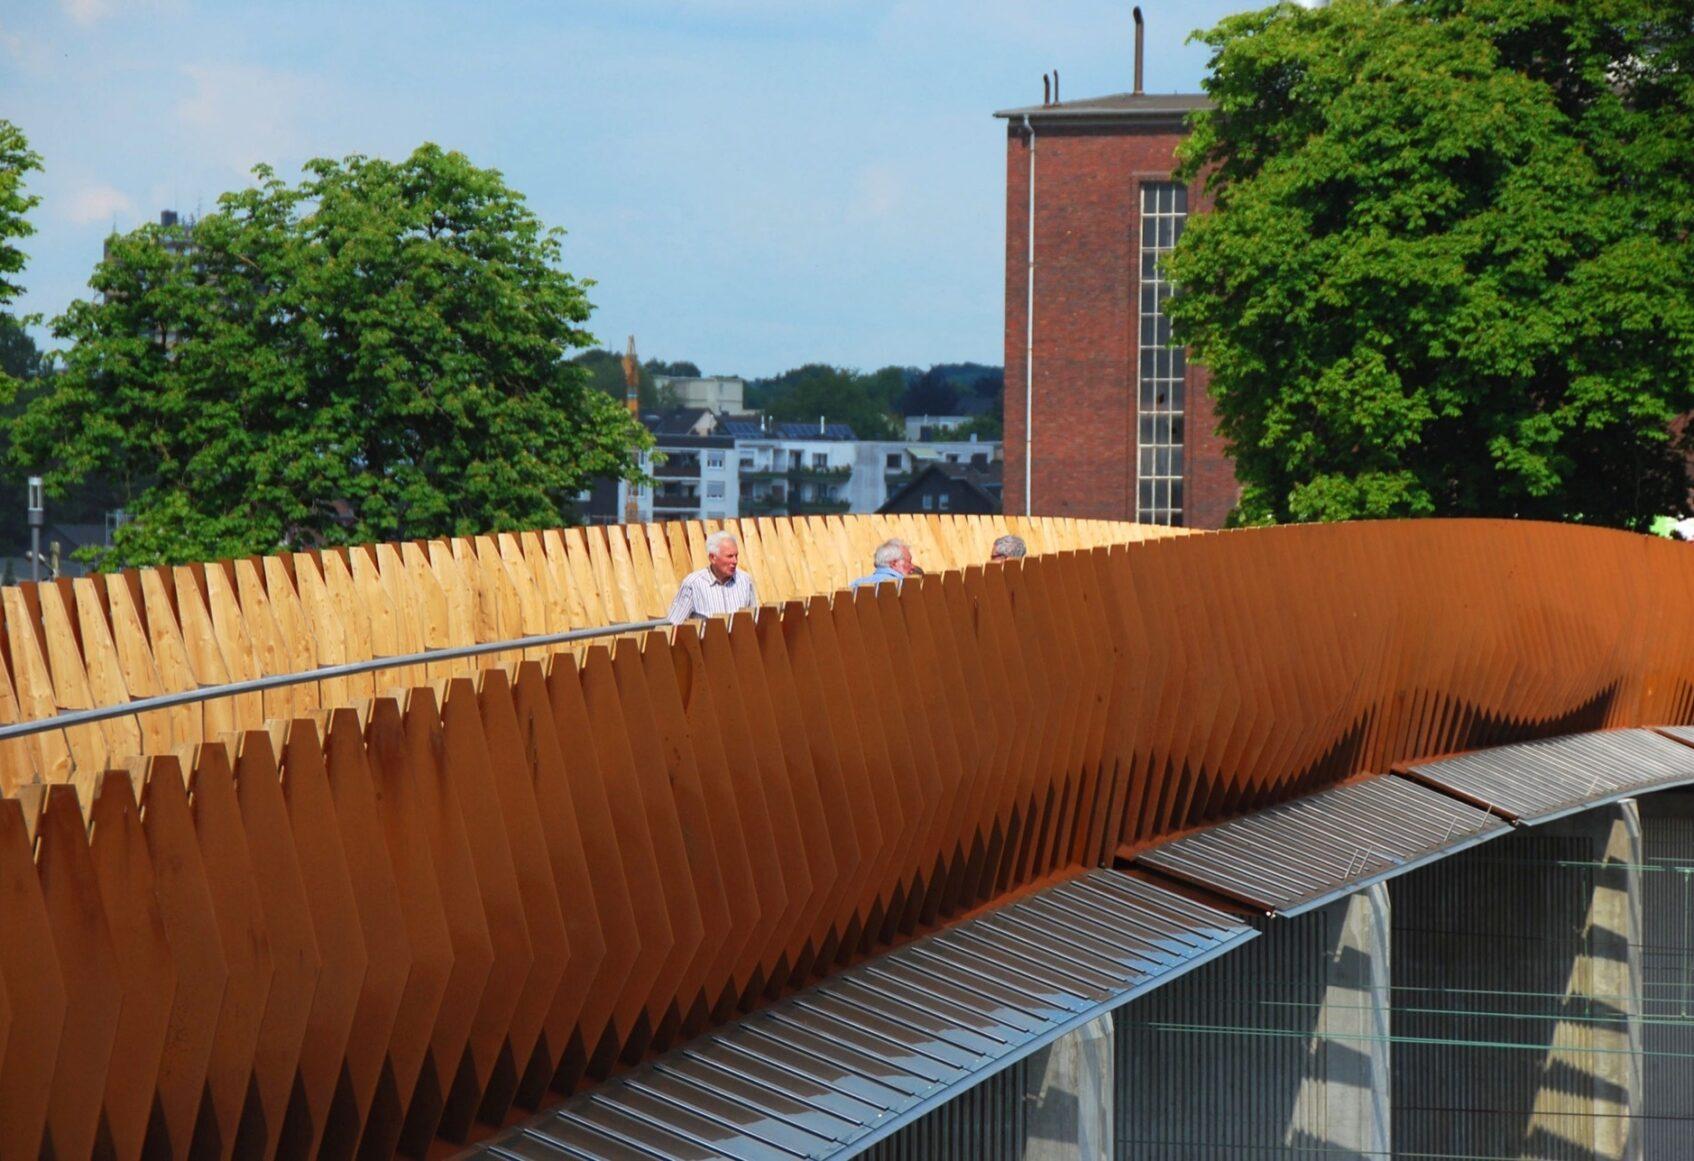 Opladen bridge side view with people walking on the bridge